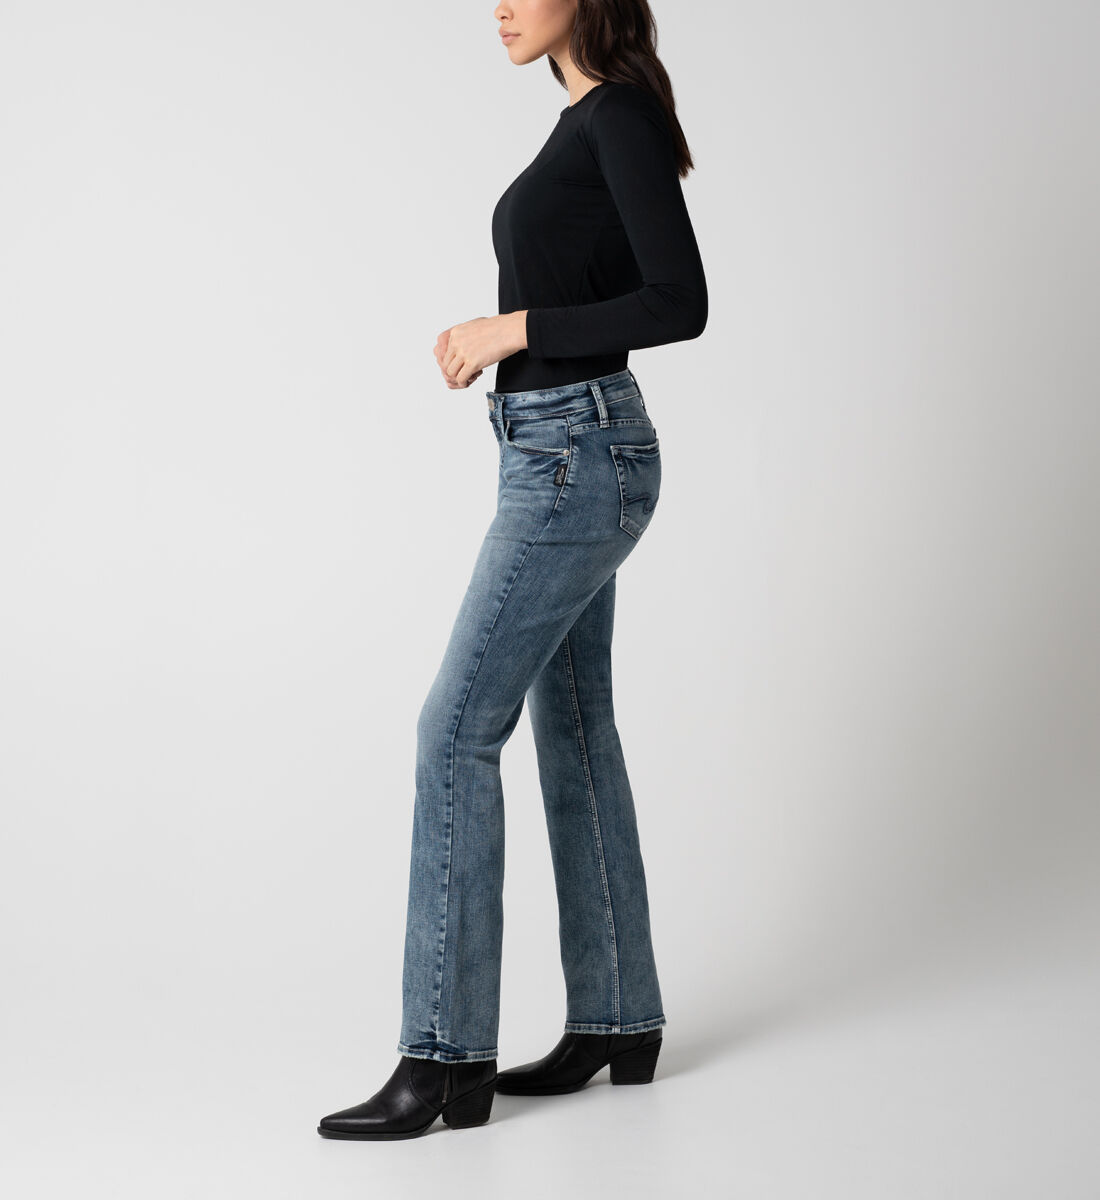 Elyse Mid Rise Slim Bootcut Jeans Side